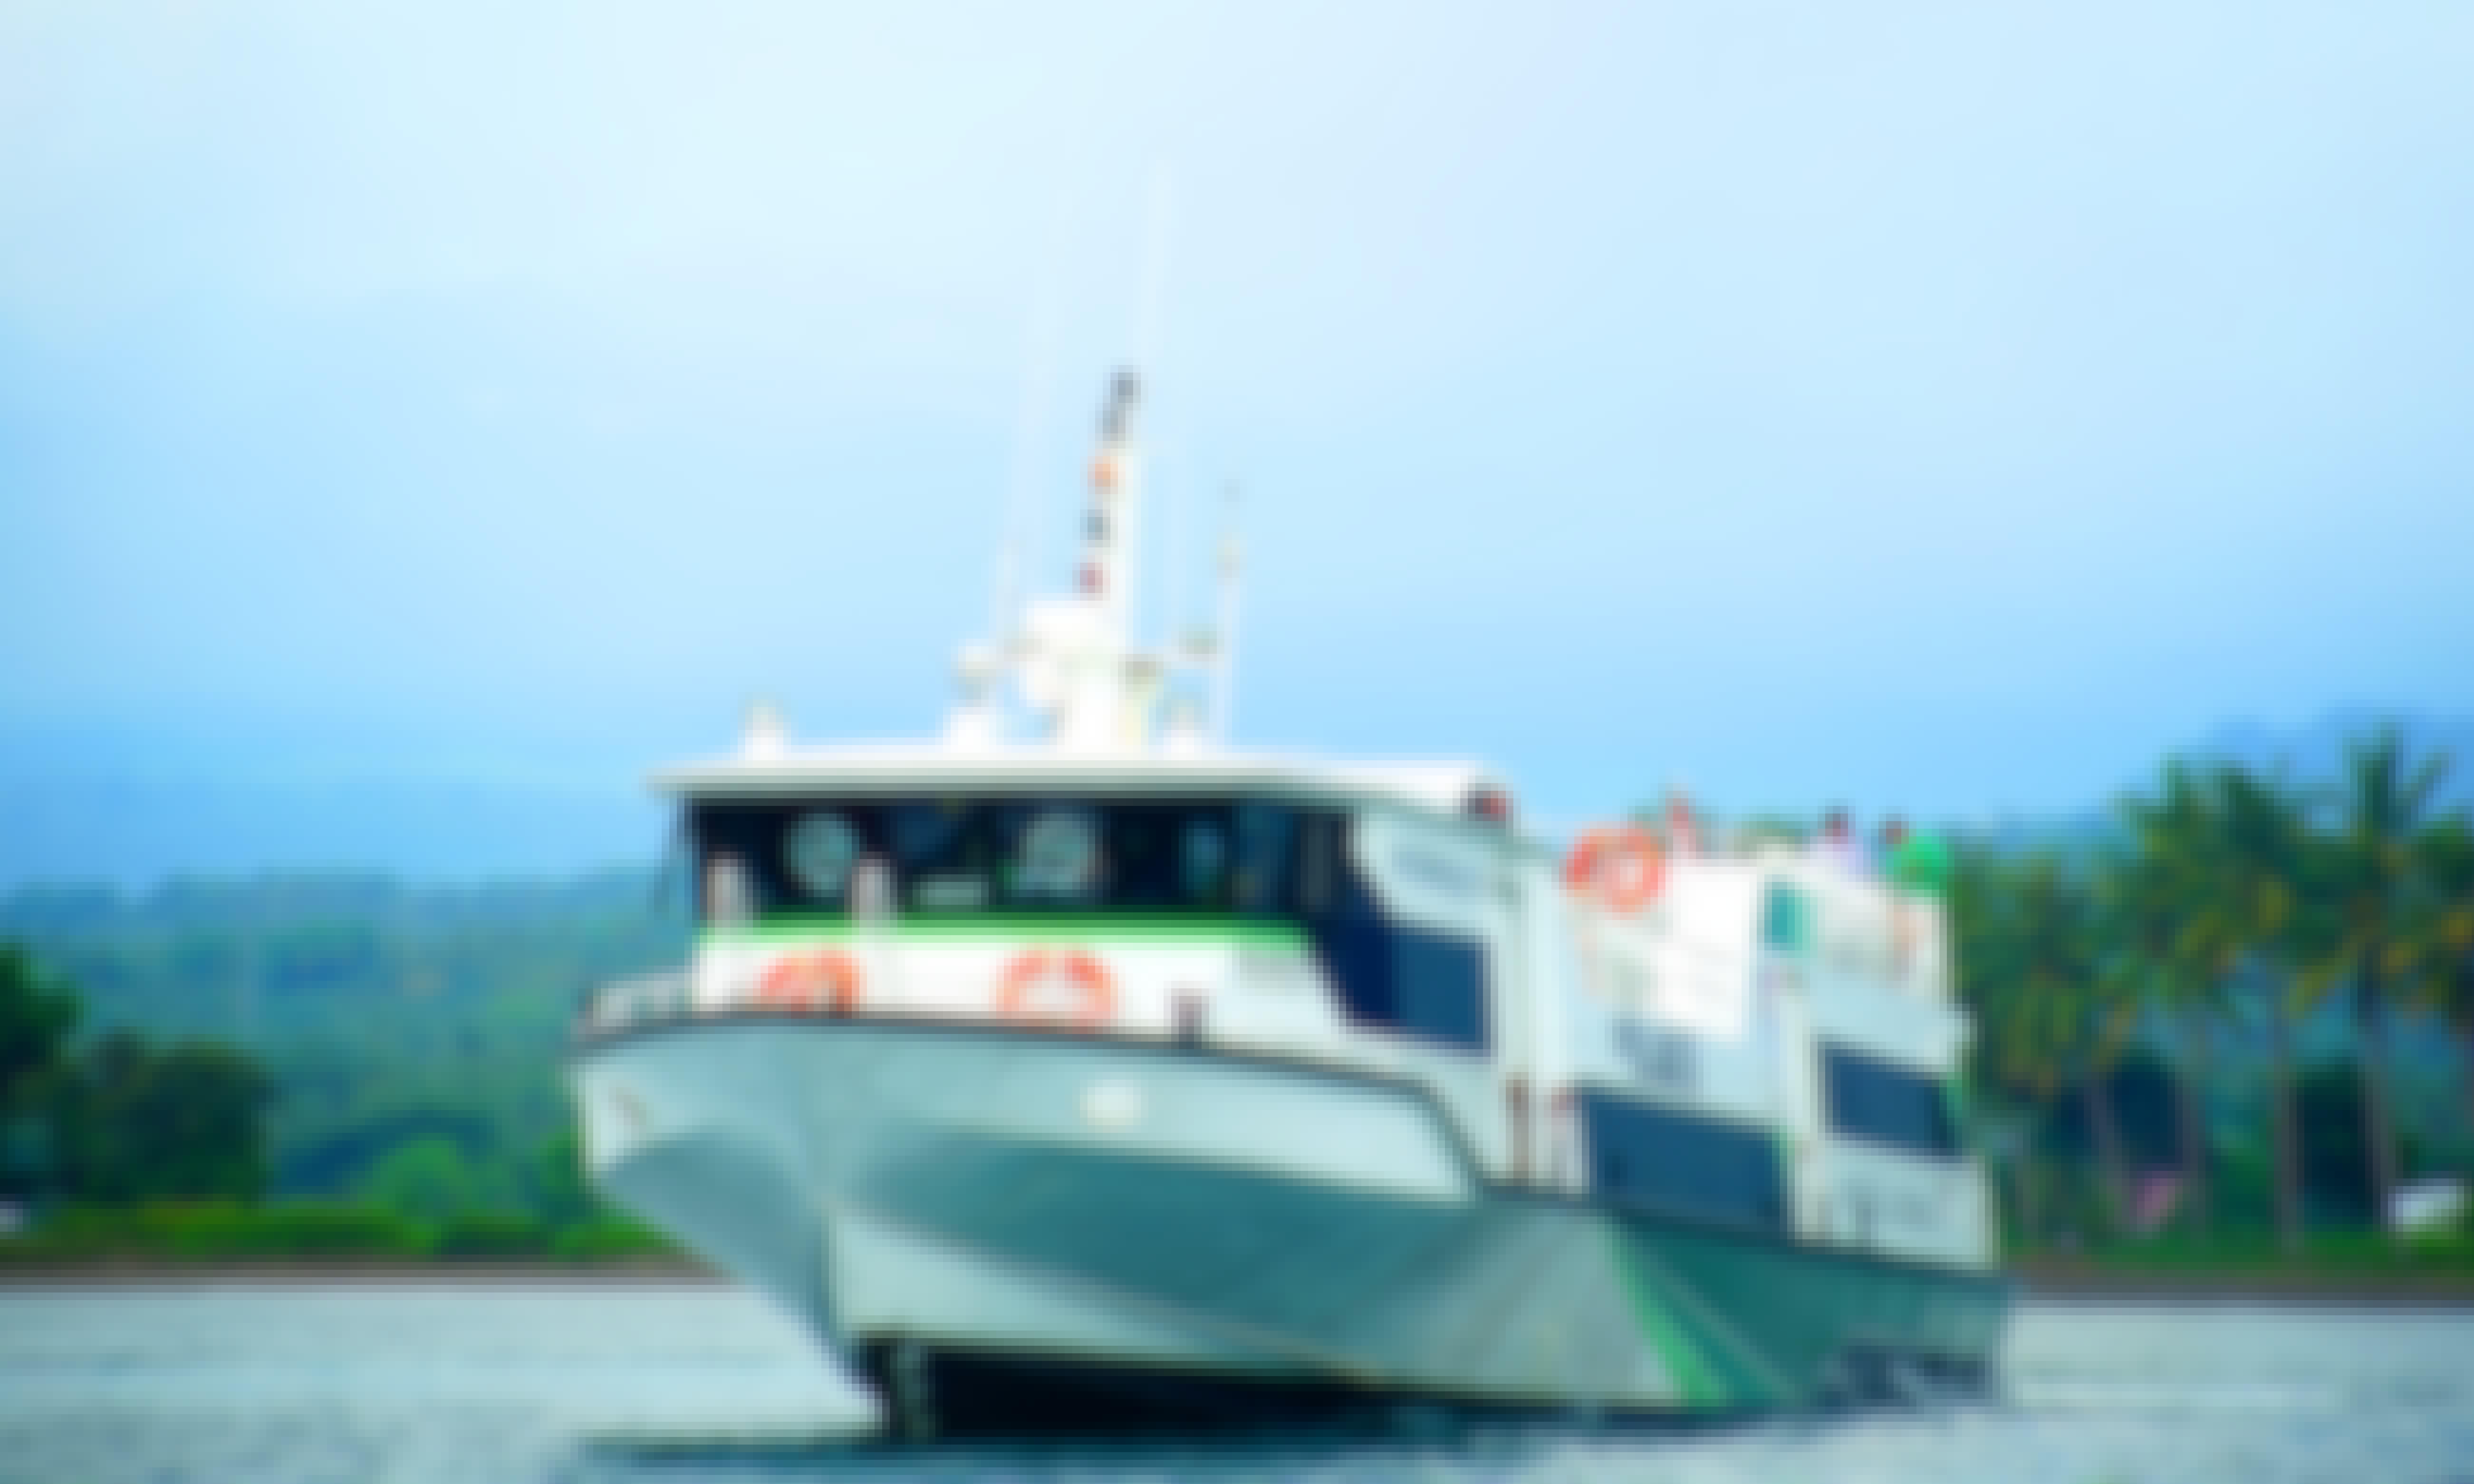 Explore Bali, Indonesia Aboard This 50-Person Passenger Boat